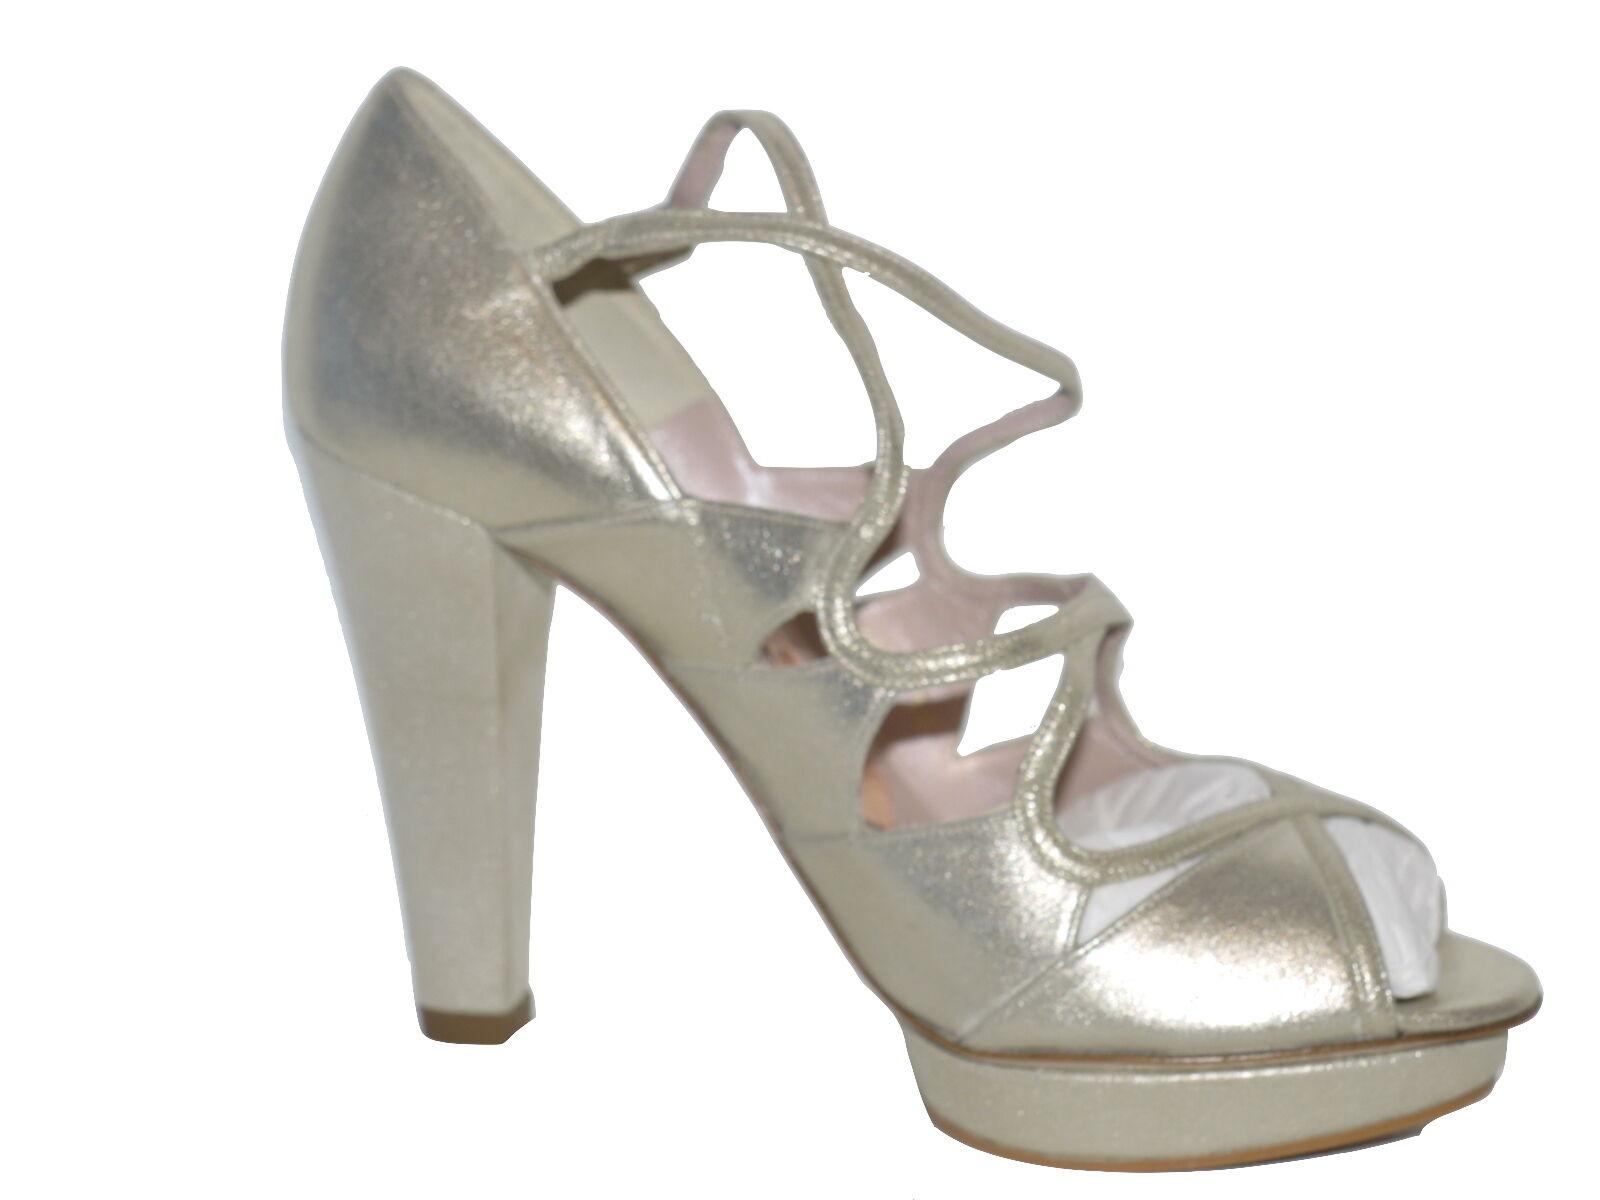 Magrit Metalic gold High Heeled Sandal NIB Size UK 4 EU 37 SP